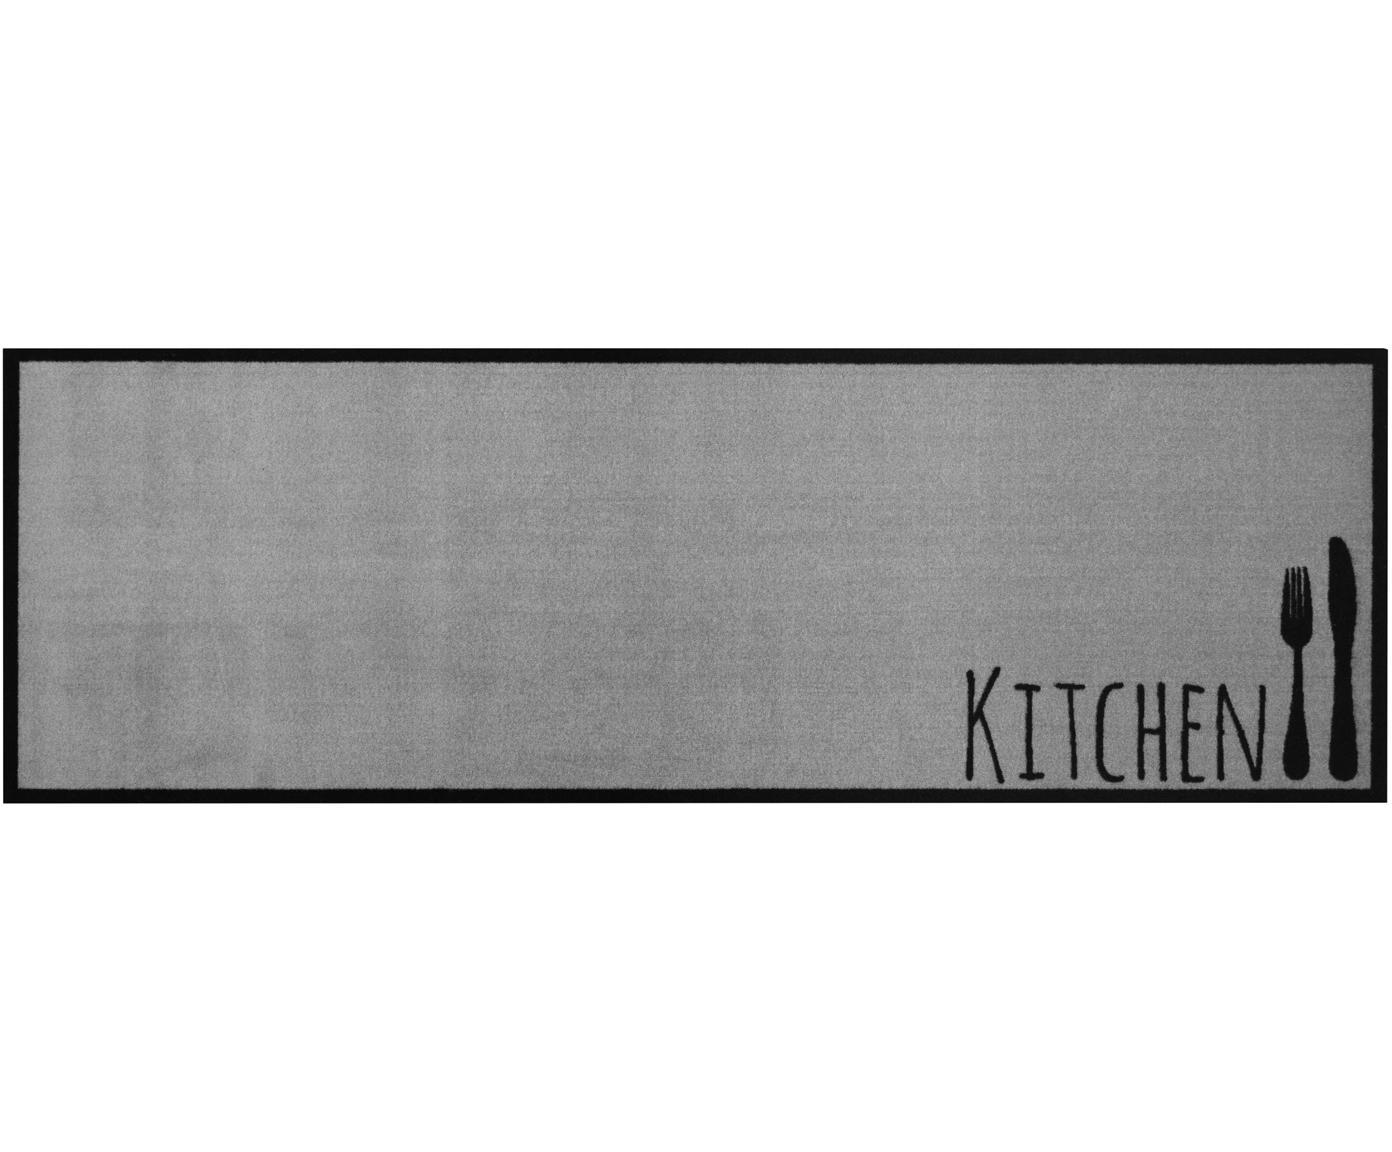 Wasbare keukenloper Kitchen Cutlery, antislip, Onderzijde: rubber, Grijs, zwart, 50 x 150 cm